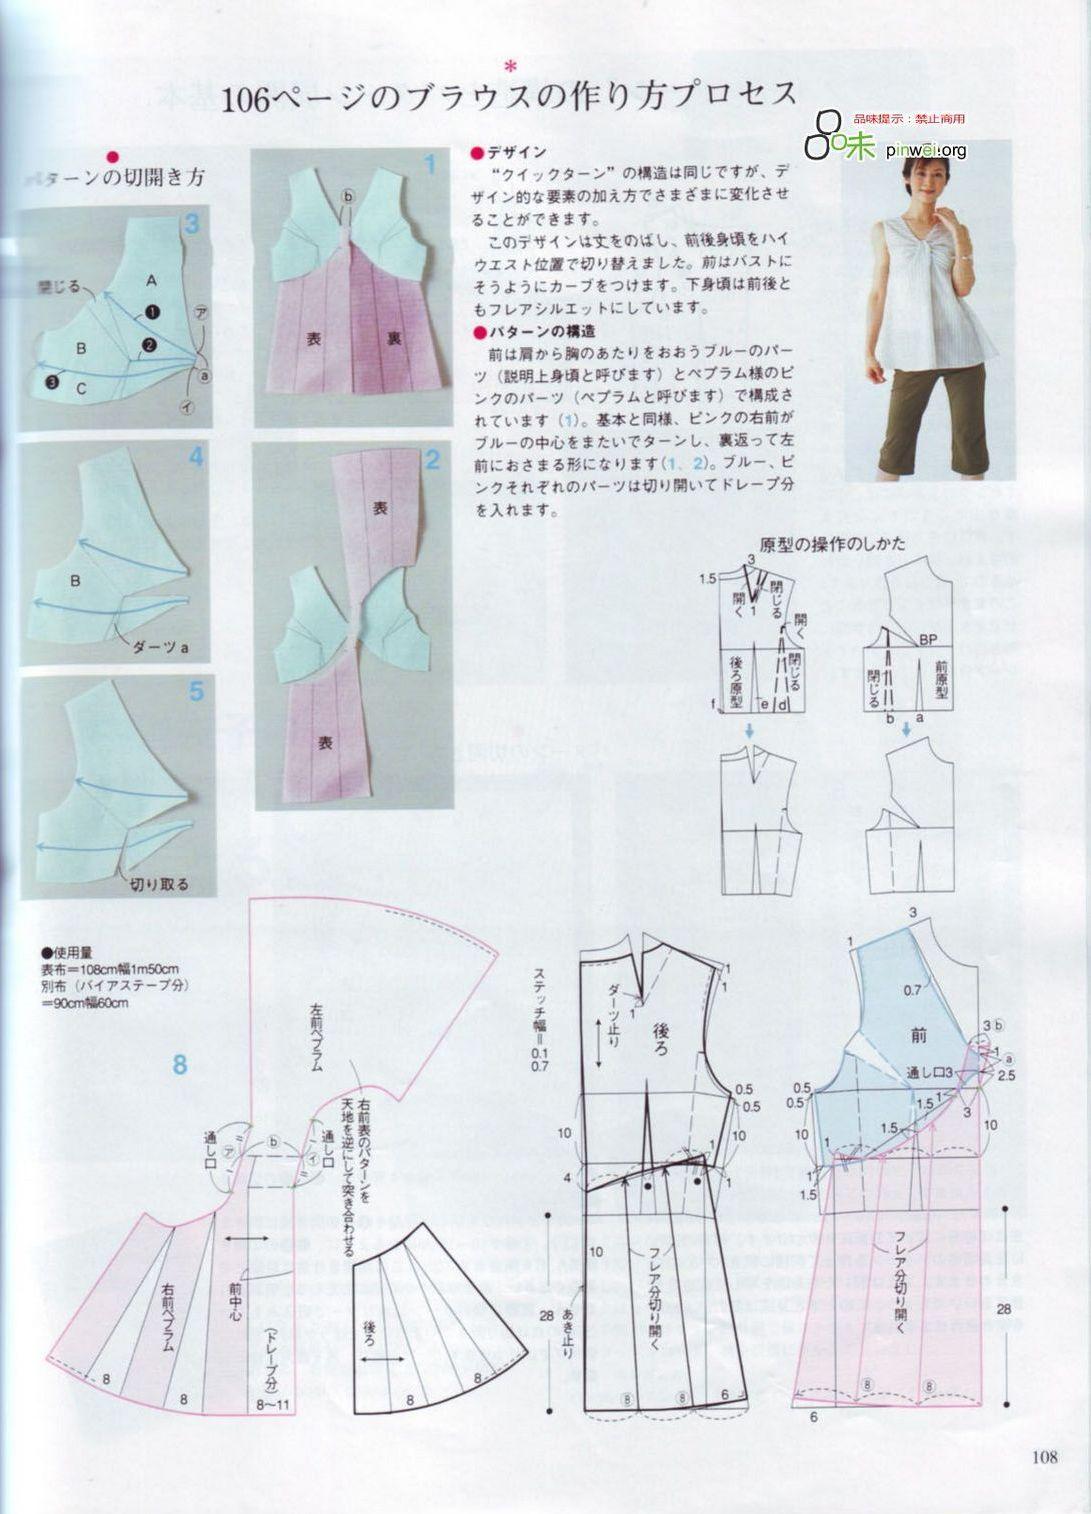 Japanese pattern | pattern | Pinterest - photo#29